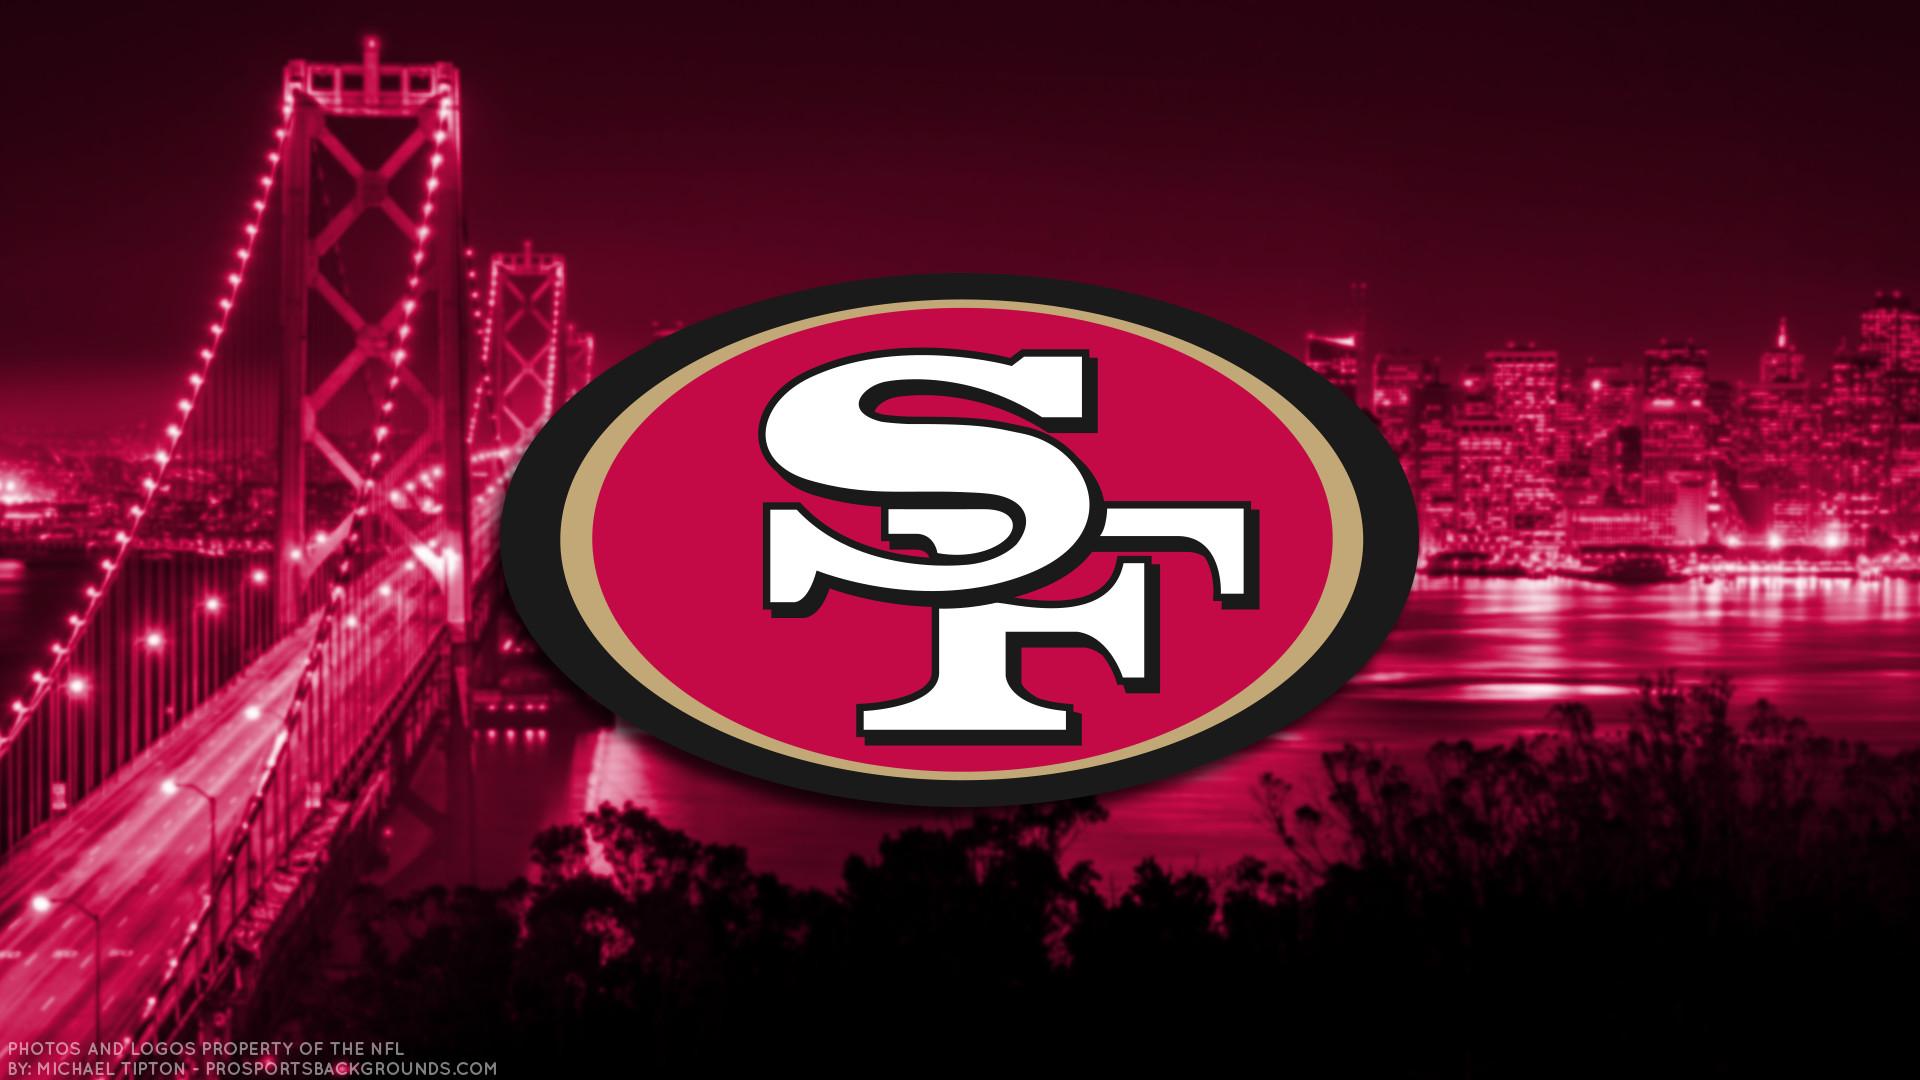 San francisco 49ers screensaver wallpaper 66 images - 49ers wallpaper hd ...